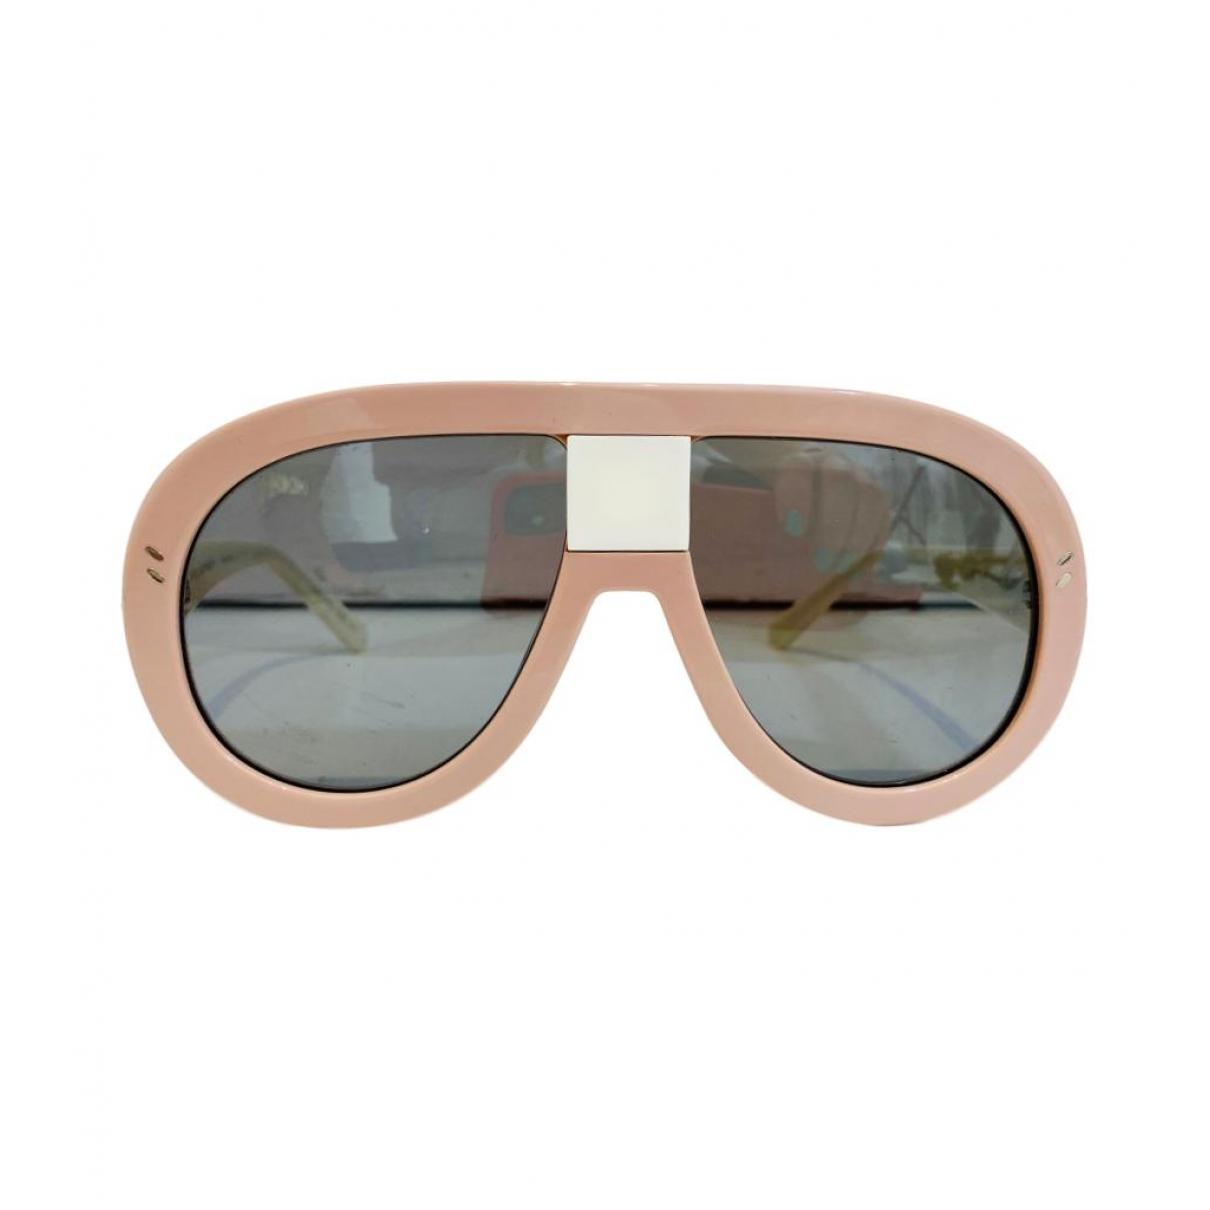 Stella Mccartney \N Beige Sunglasses for Women \N